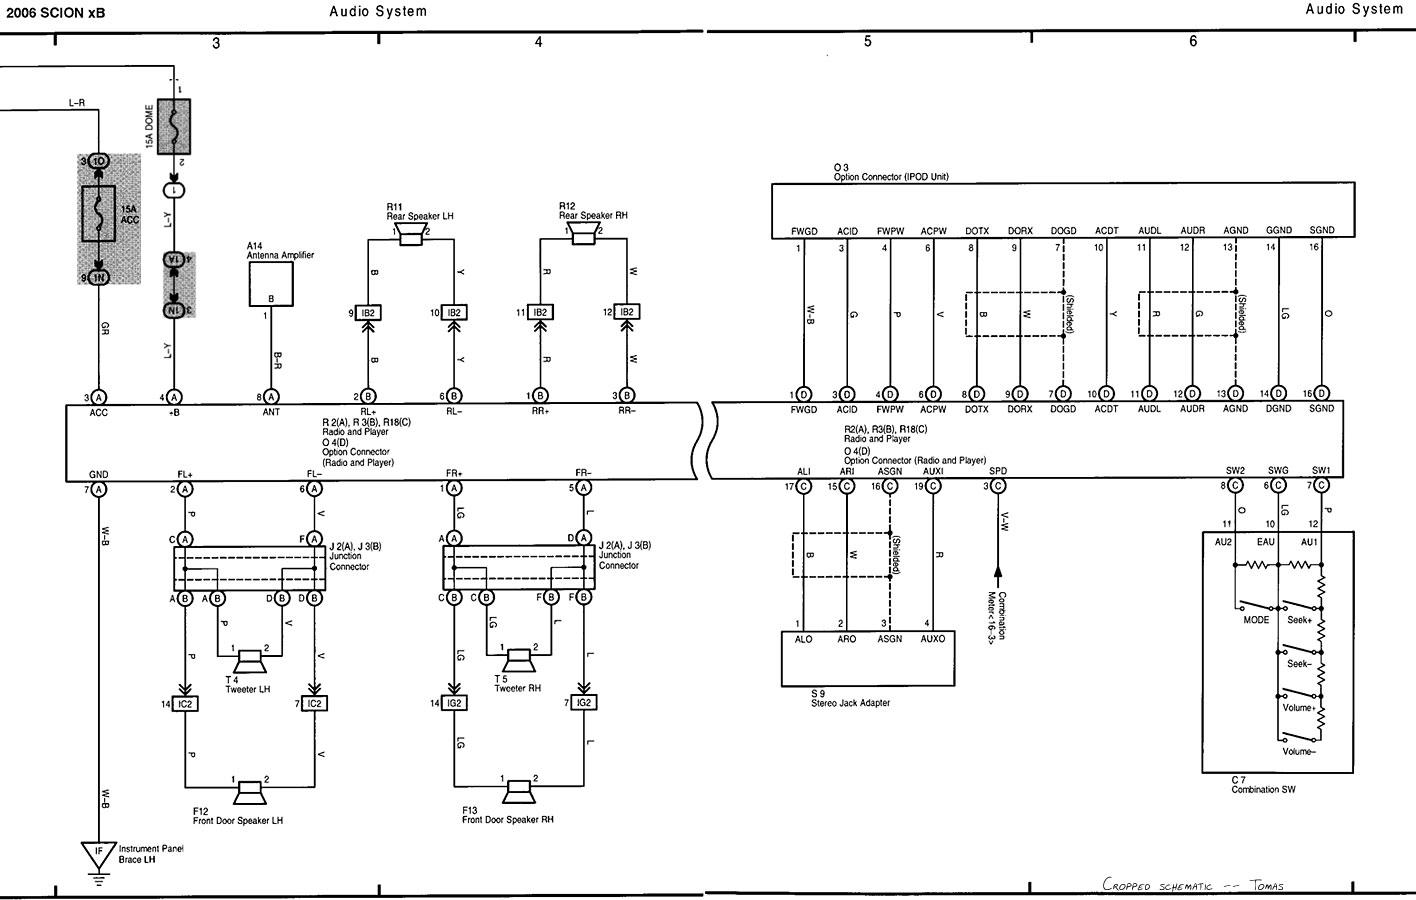 medium resolution of scion xd fuse diagram control cables wiring diagram 2008 ford mustang wiring diagram 2006 scion